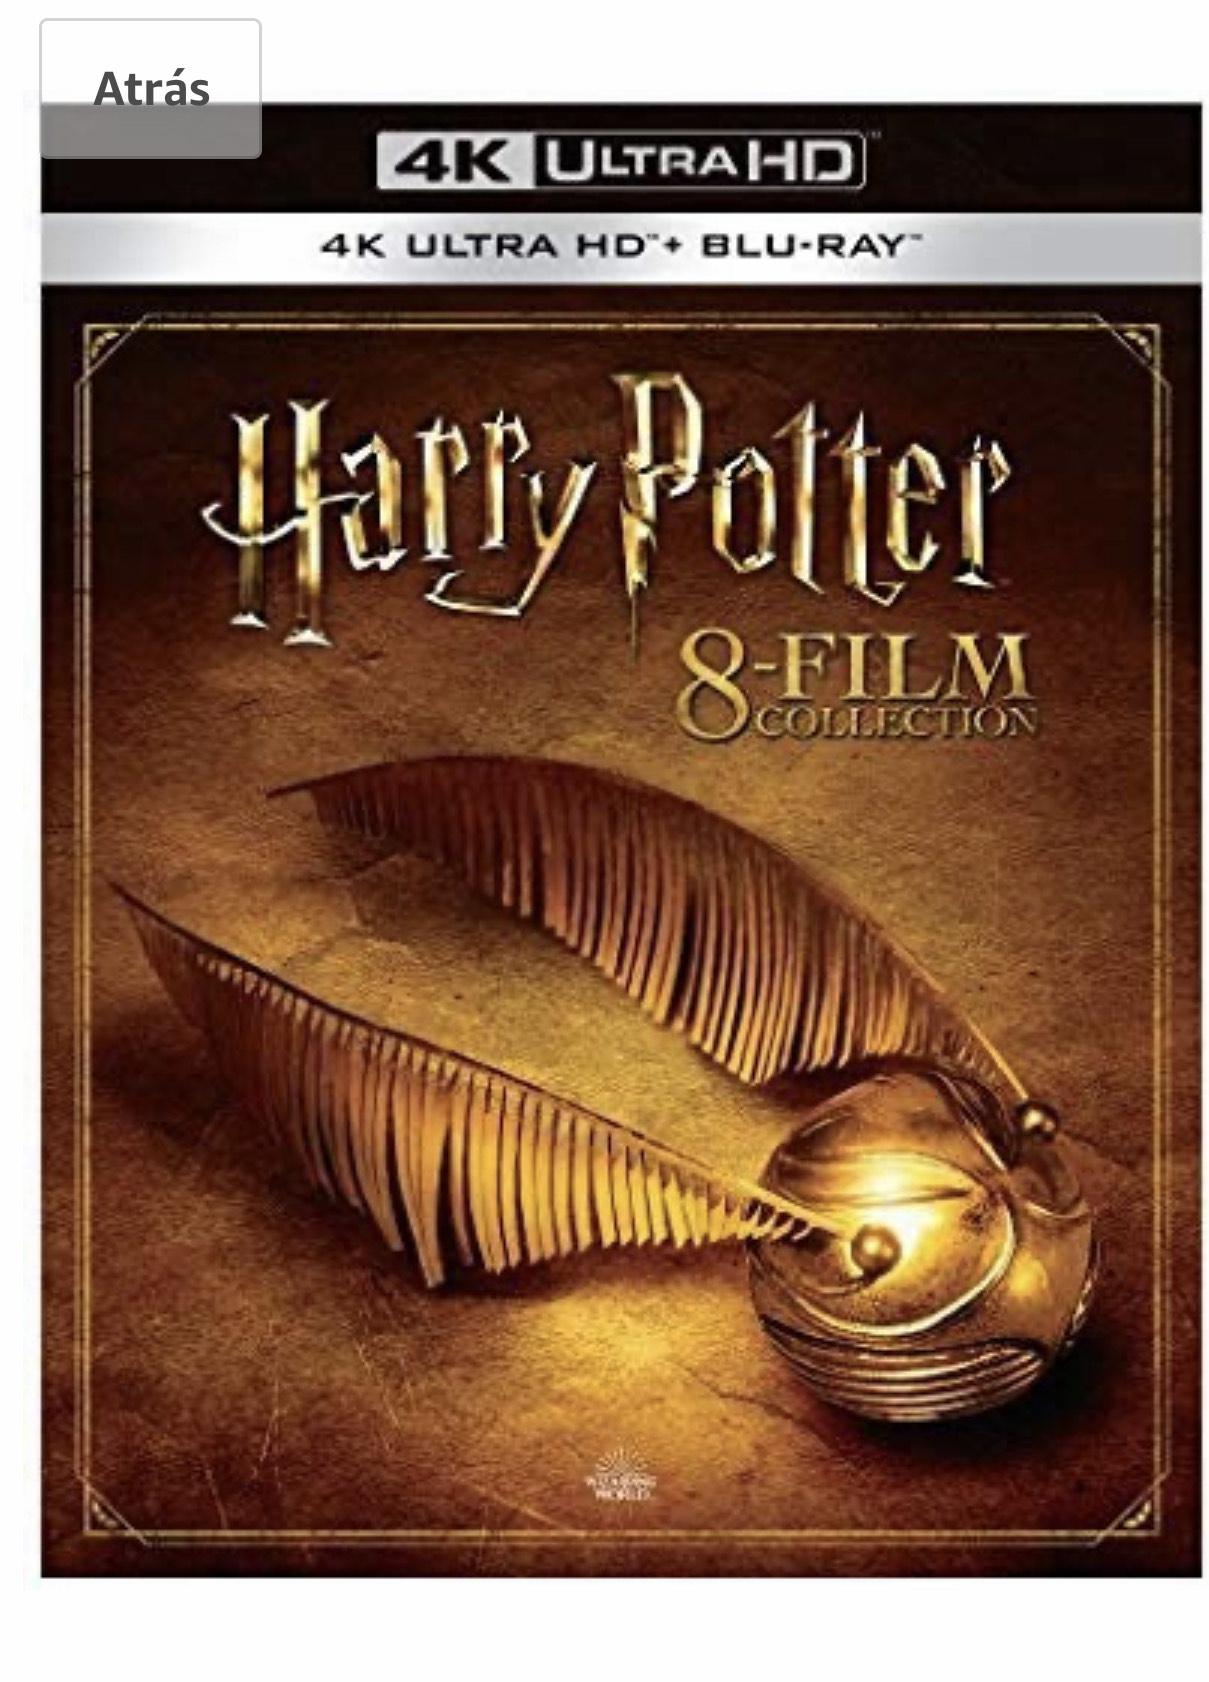 Amazon México la saga completa de Harry potter 8 discos en Blu-ray 4K UHD